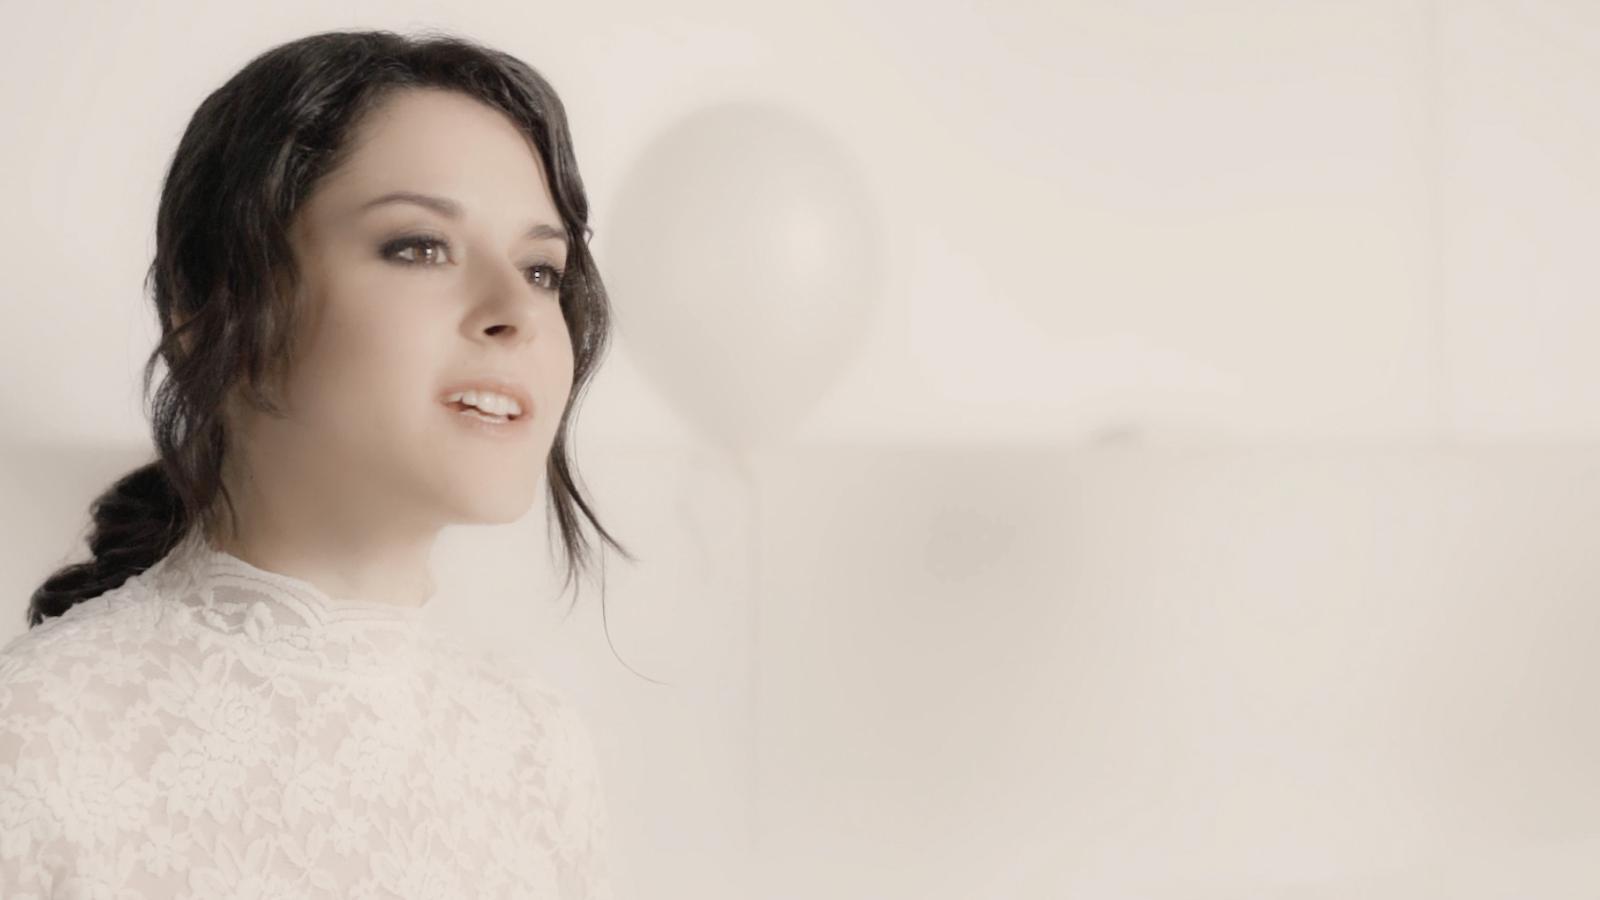 Miriam Luna estrena el videoclip 'Isn't she lovely